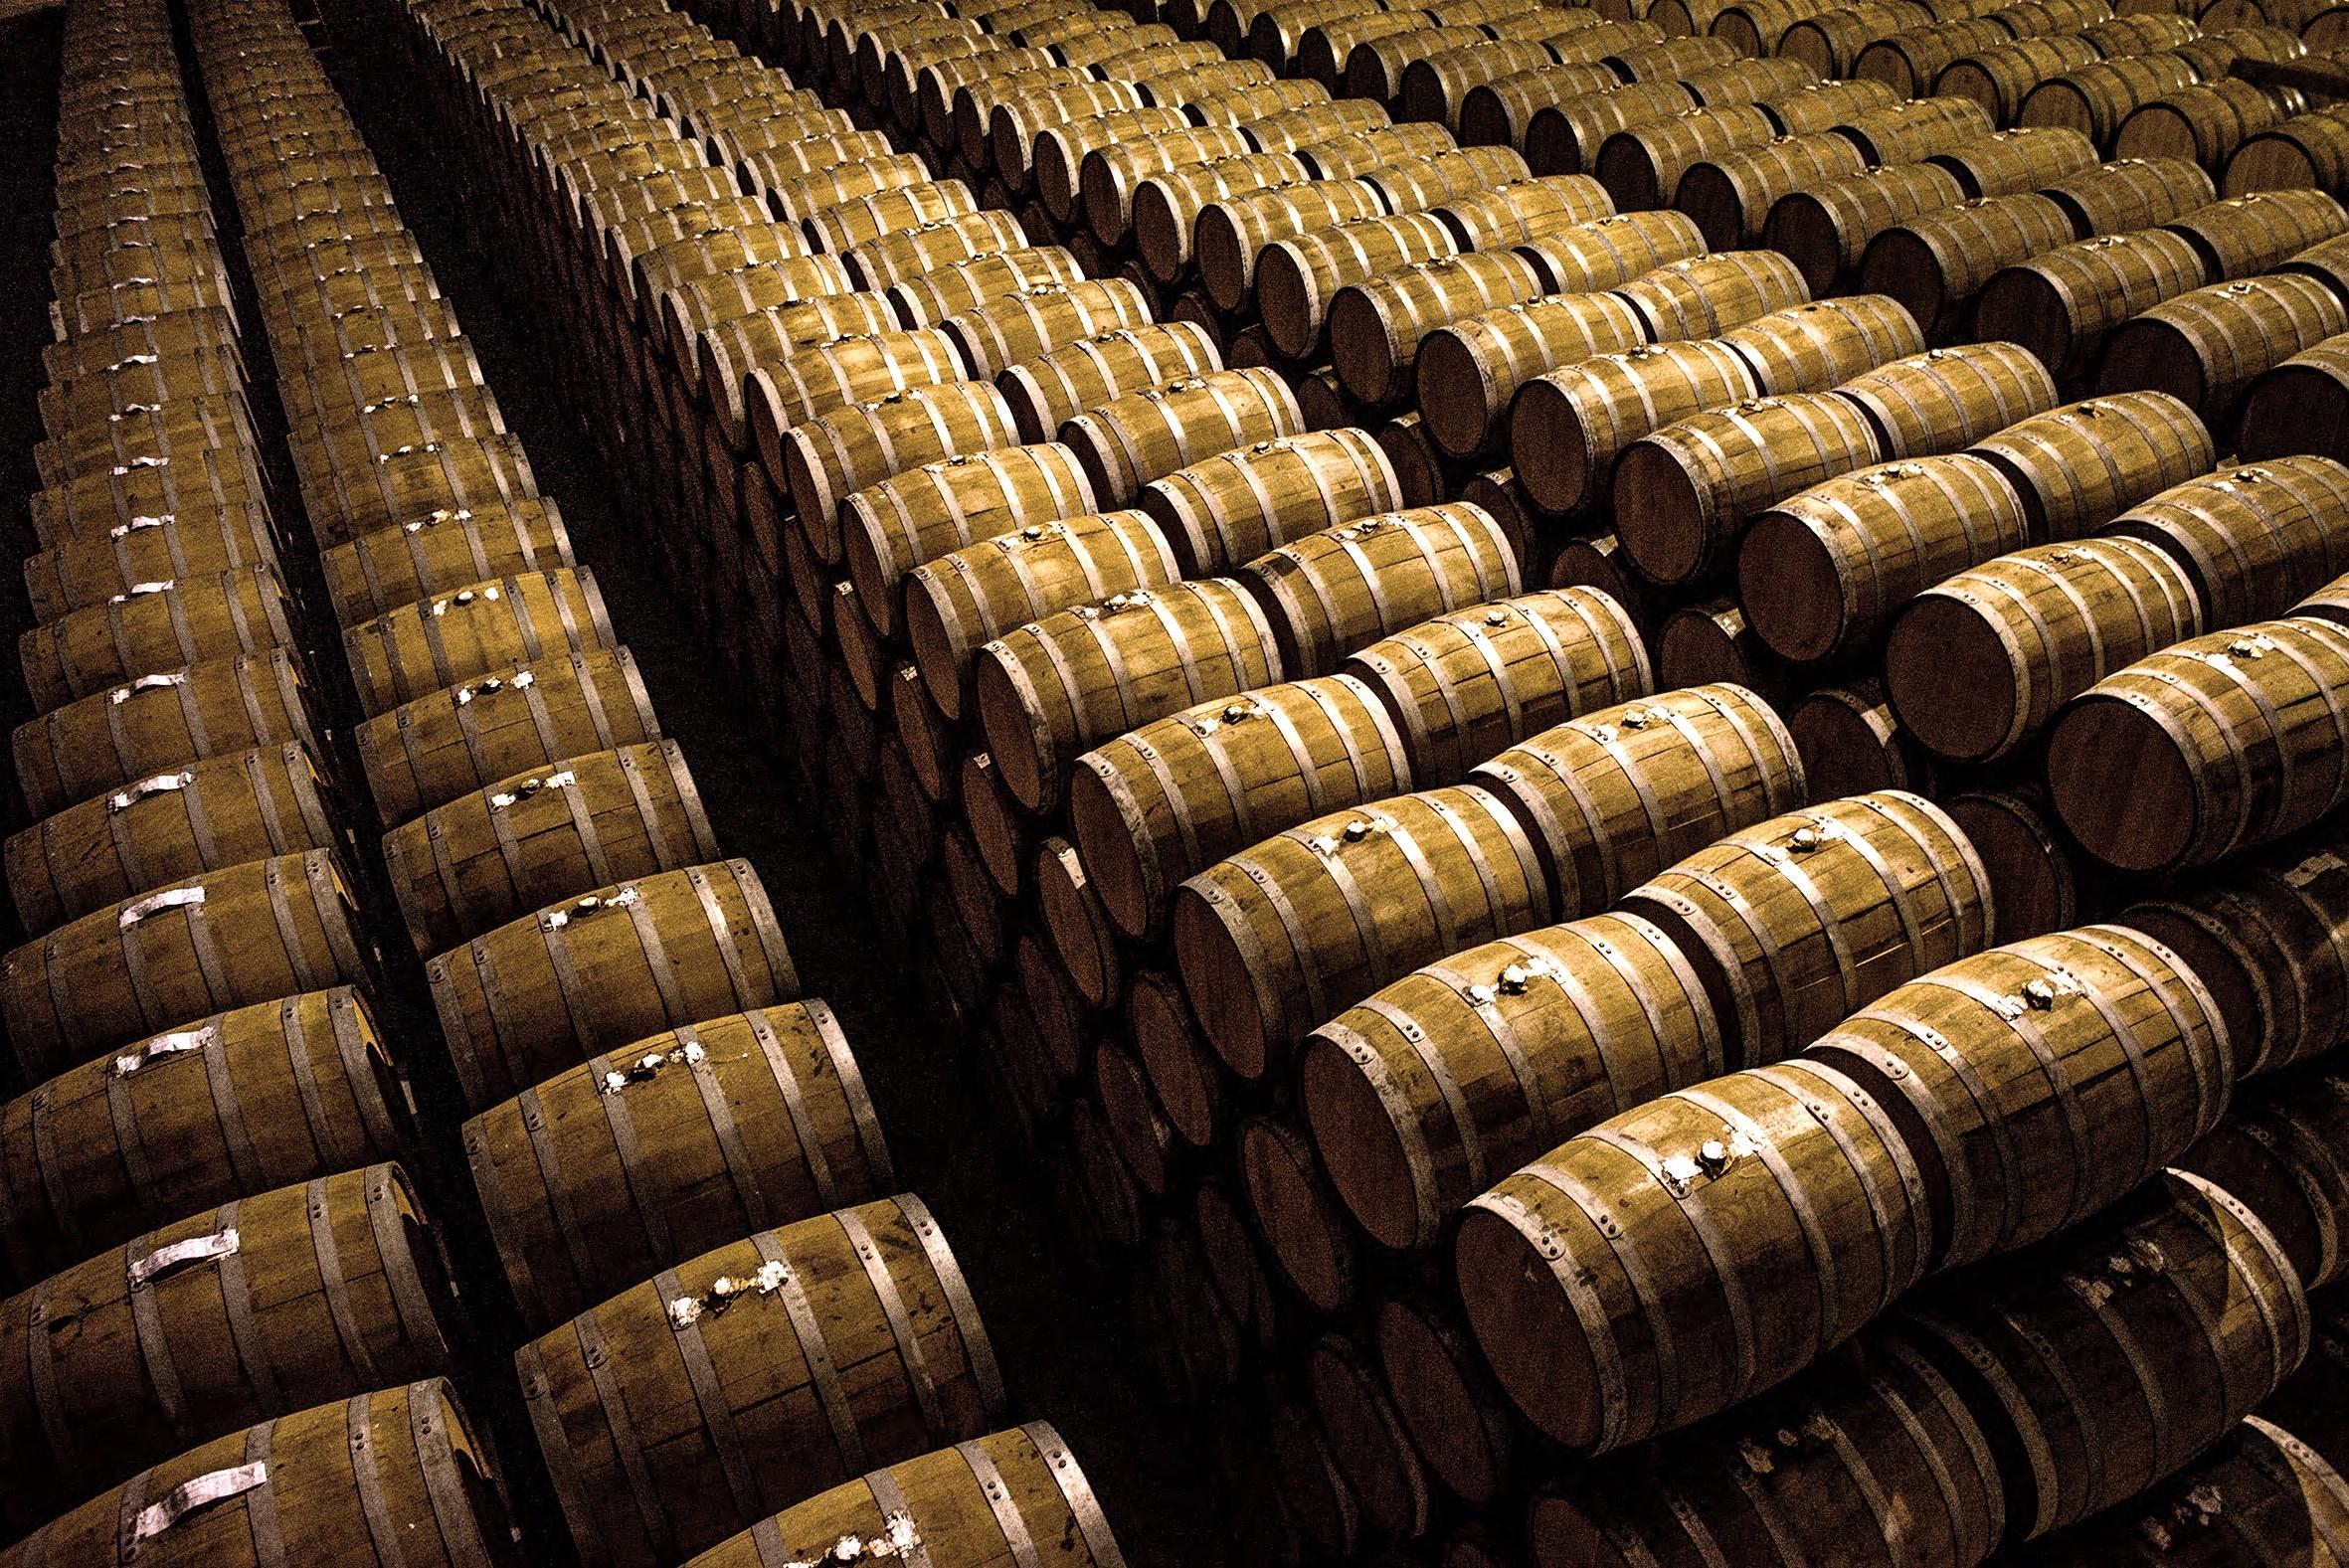 Image result for Barrels of Tequila